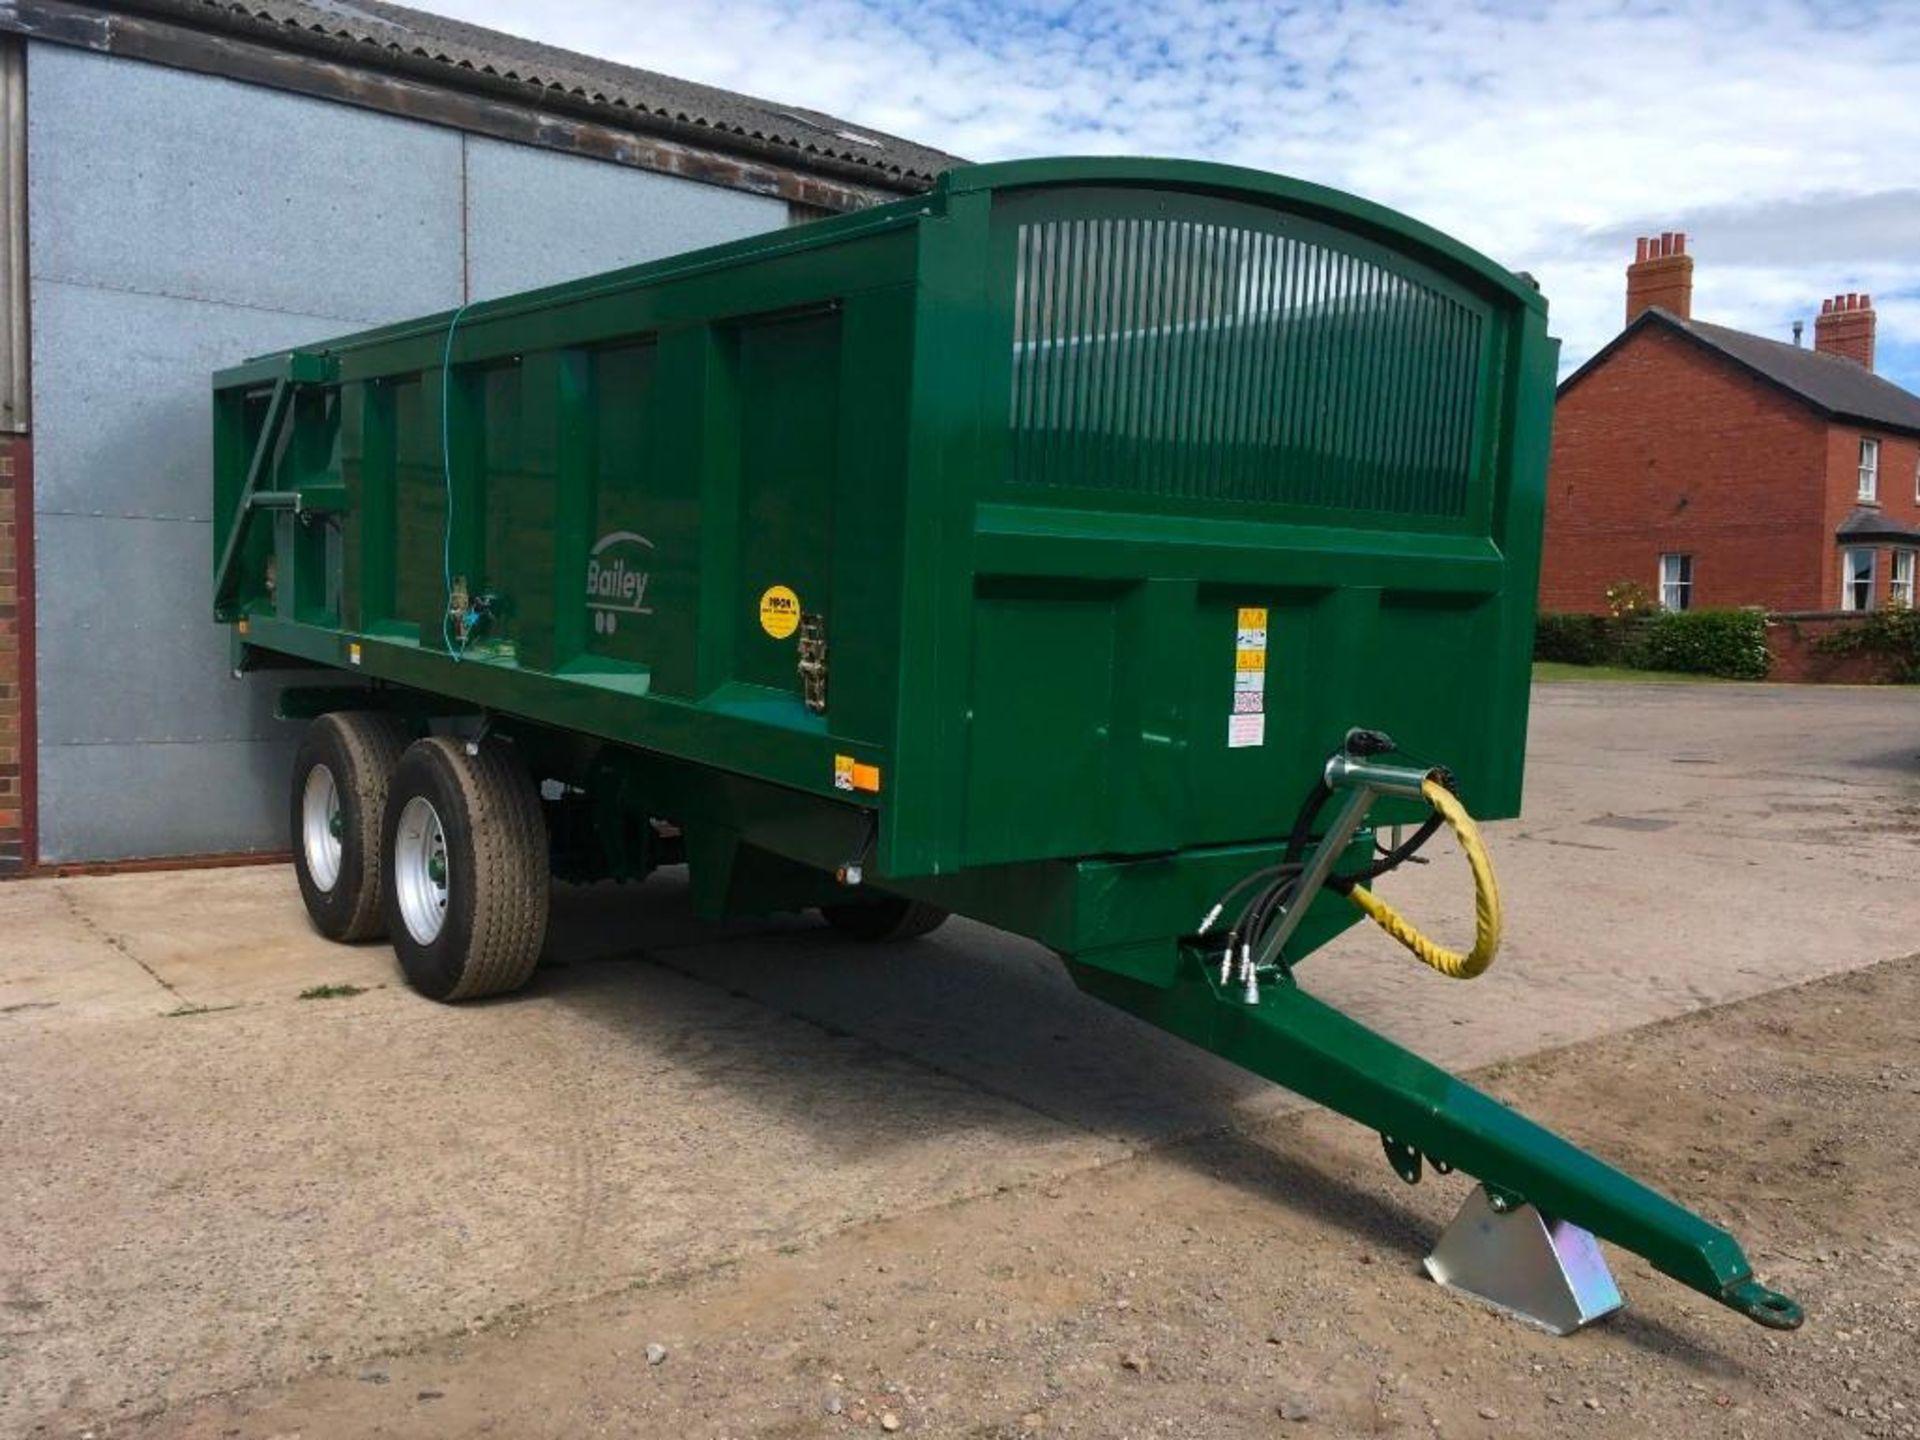 2018 Bailey 14t twin axle trailer, hydraulic back door, manual grain chute, rollover sheet, sprung d - Image 8 of 17